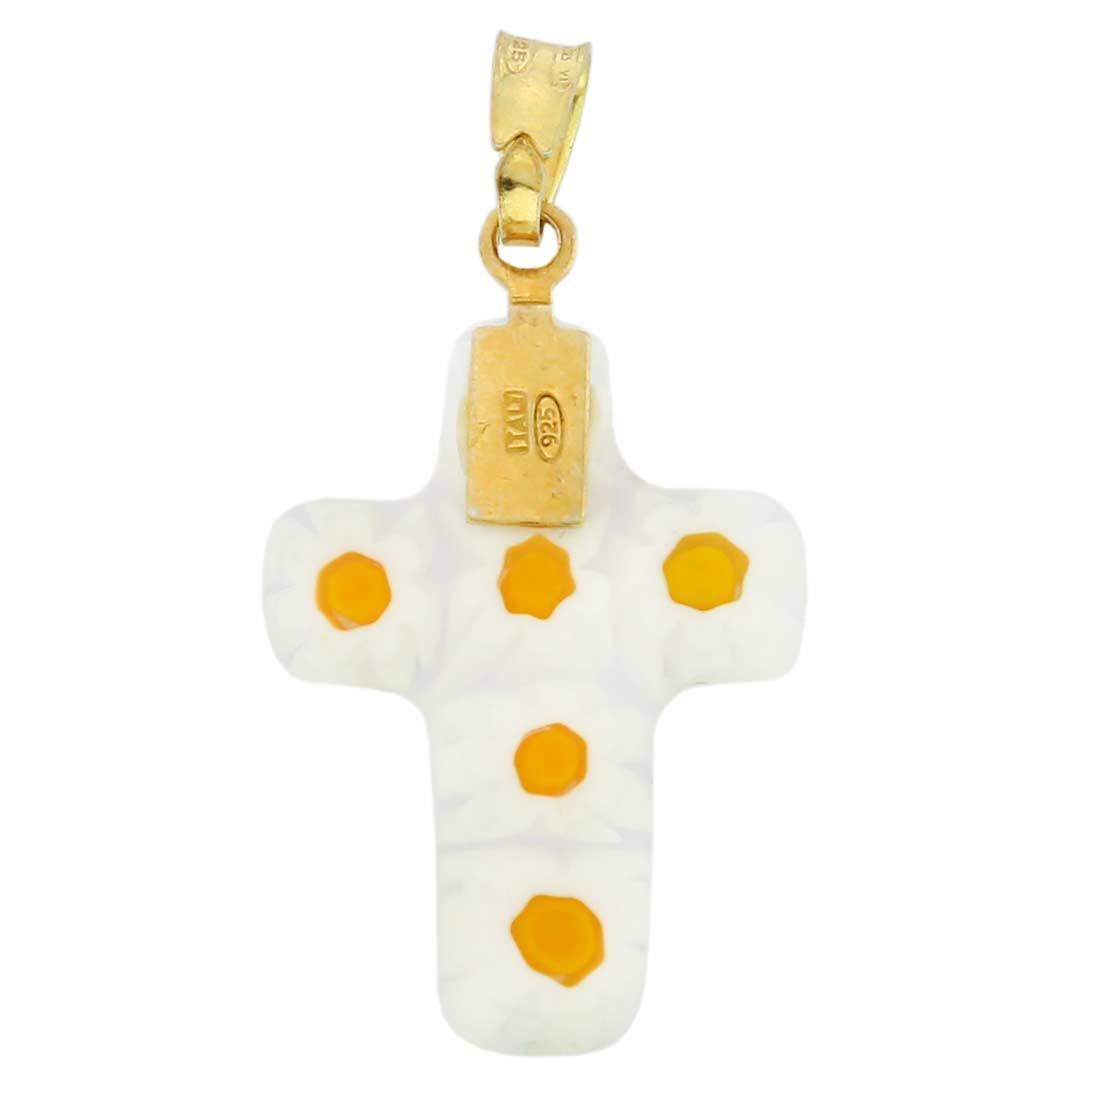 Millefiori glass cross pendant #1